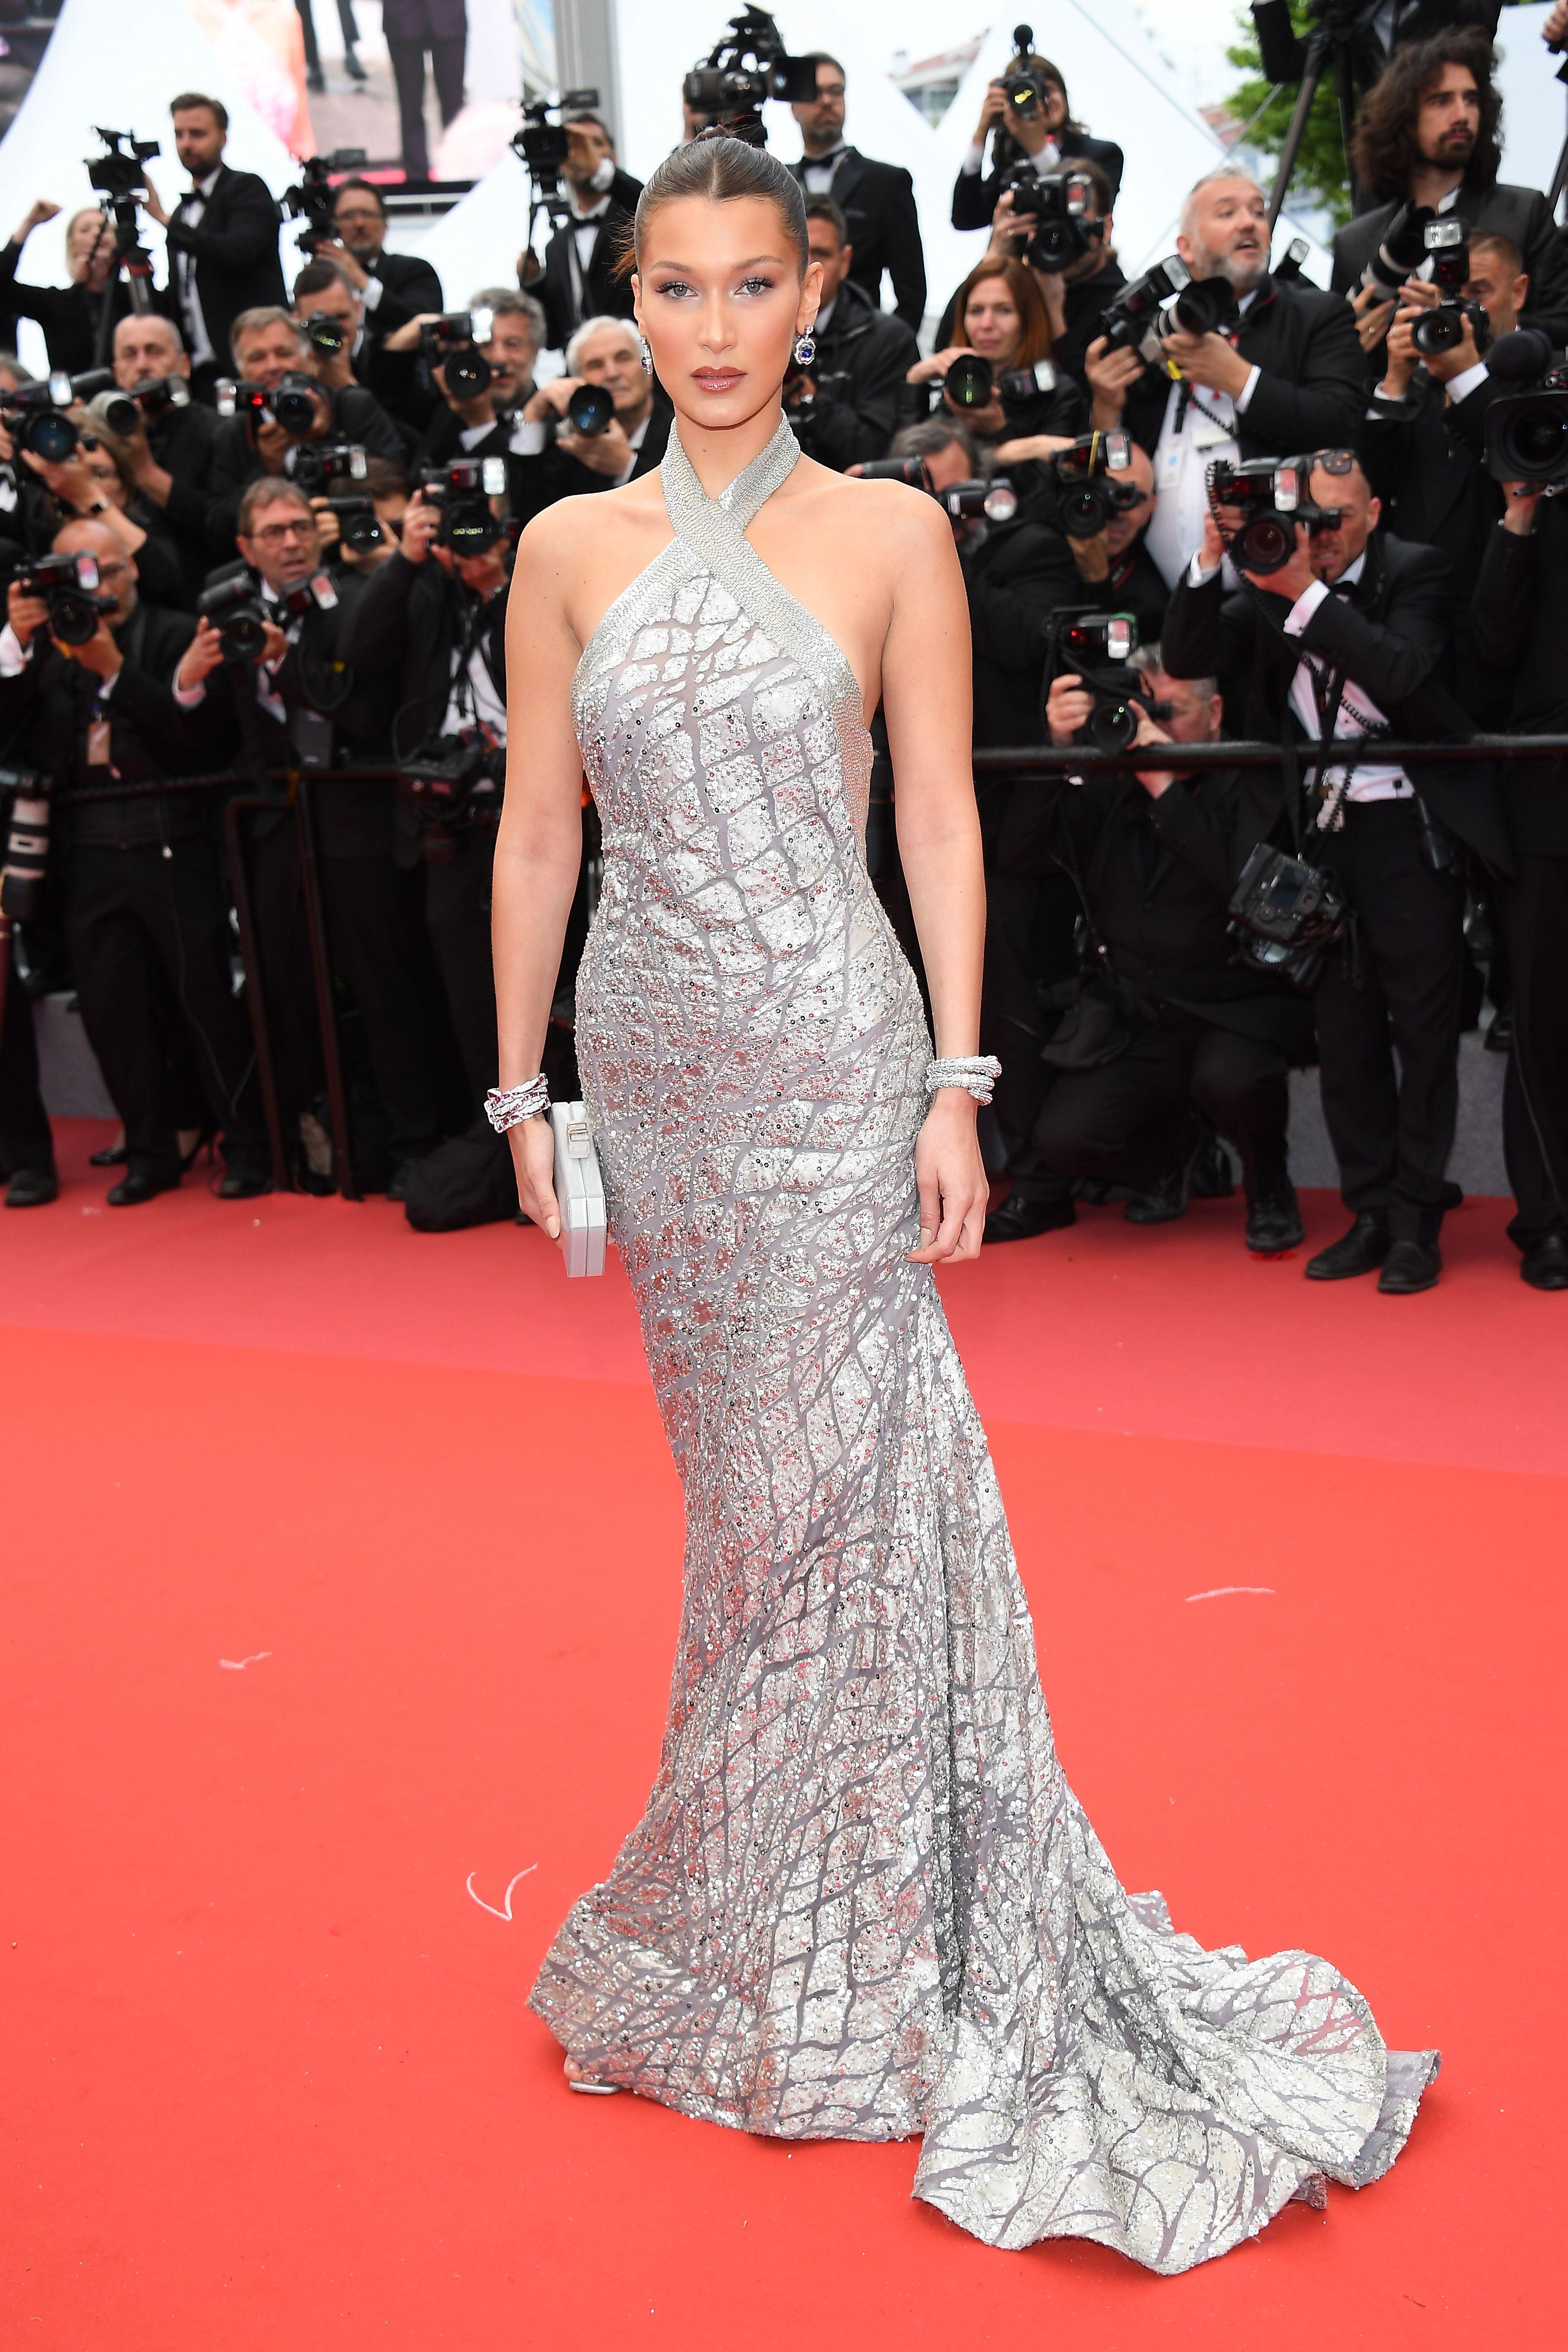 Cannes Film Festival 2018 Model Photos —